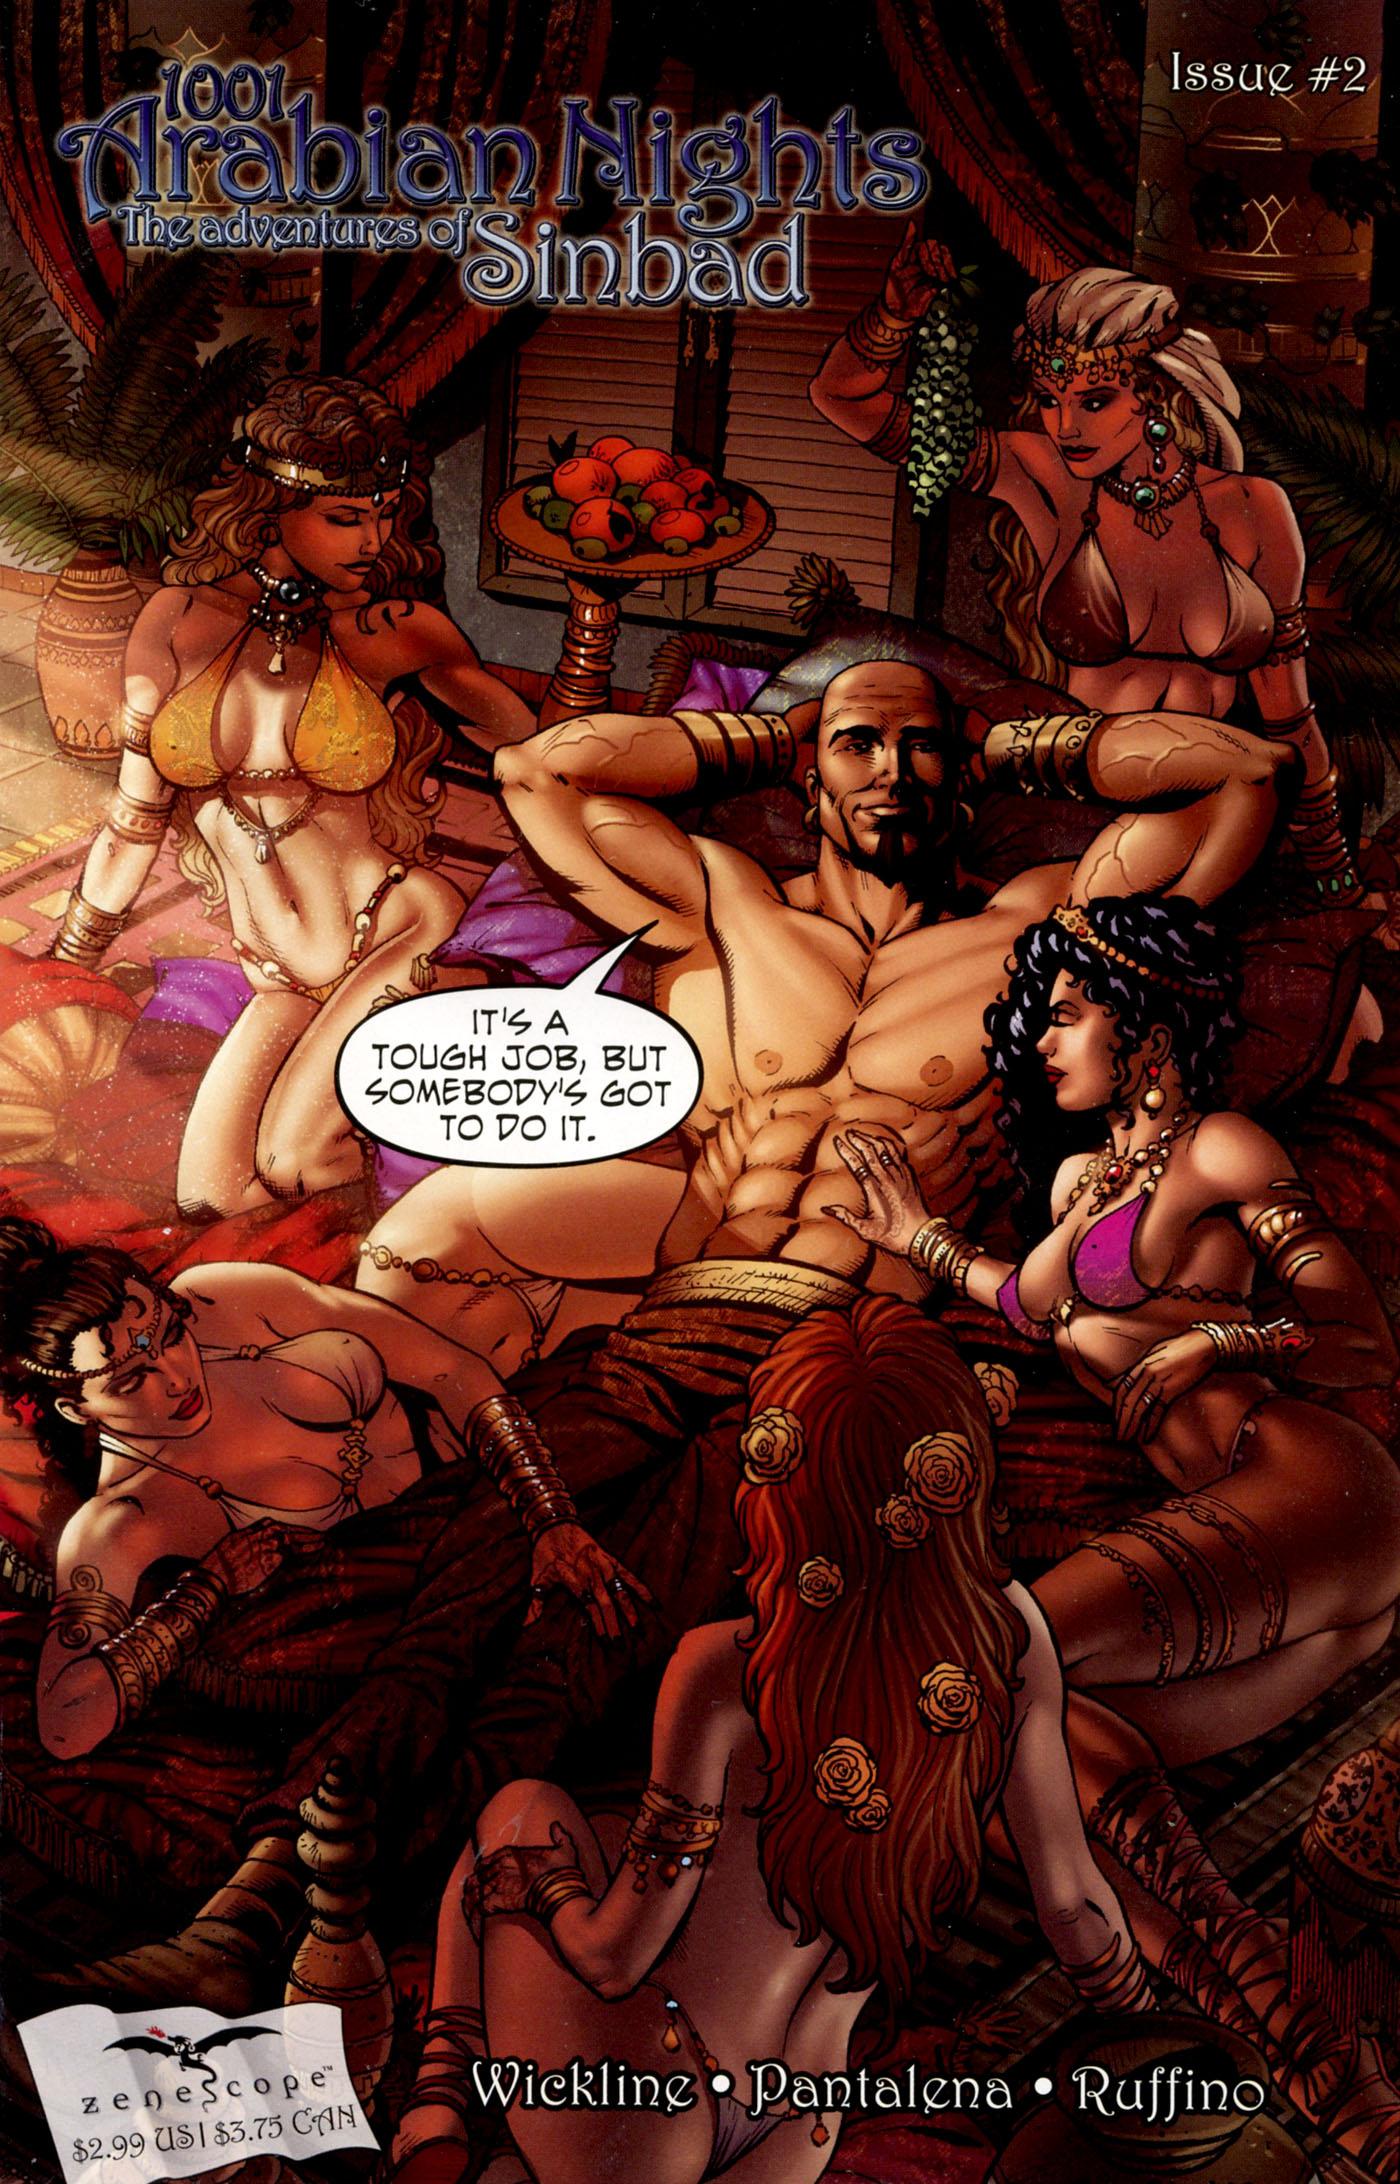 Read online 1001 Arabian Nights: The Adventures of Sinbad comic -  Issue #2 - 3